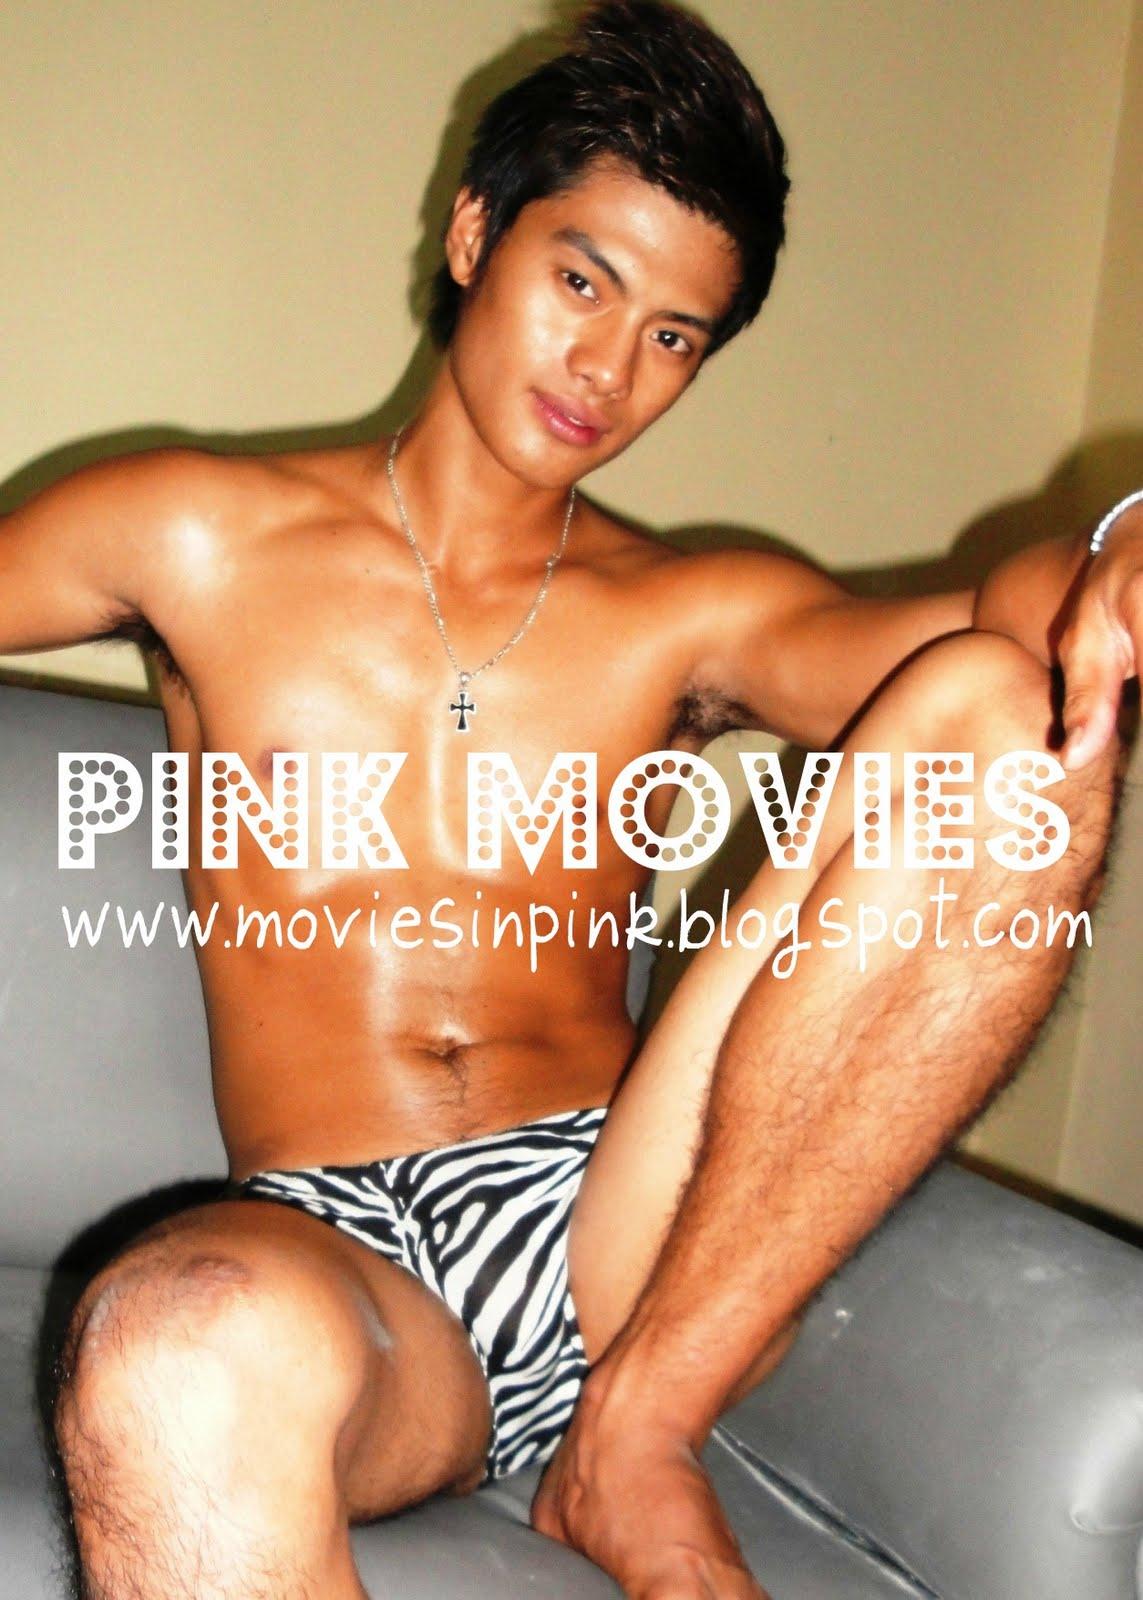 http://4.bp.blogspot.com/-GtfS6a41l6E/TjBd0Jk_yUI/AAAAAAAALO4/3gRPs9USbb8/s1600/james+pinca3.jpg